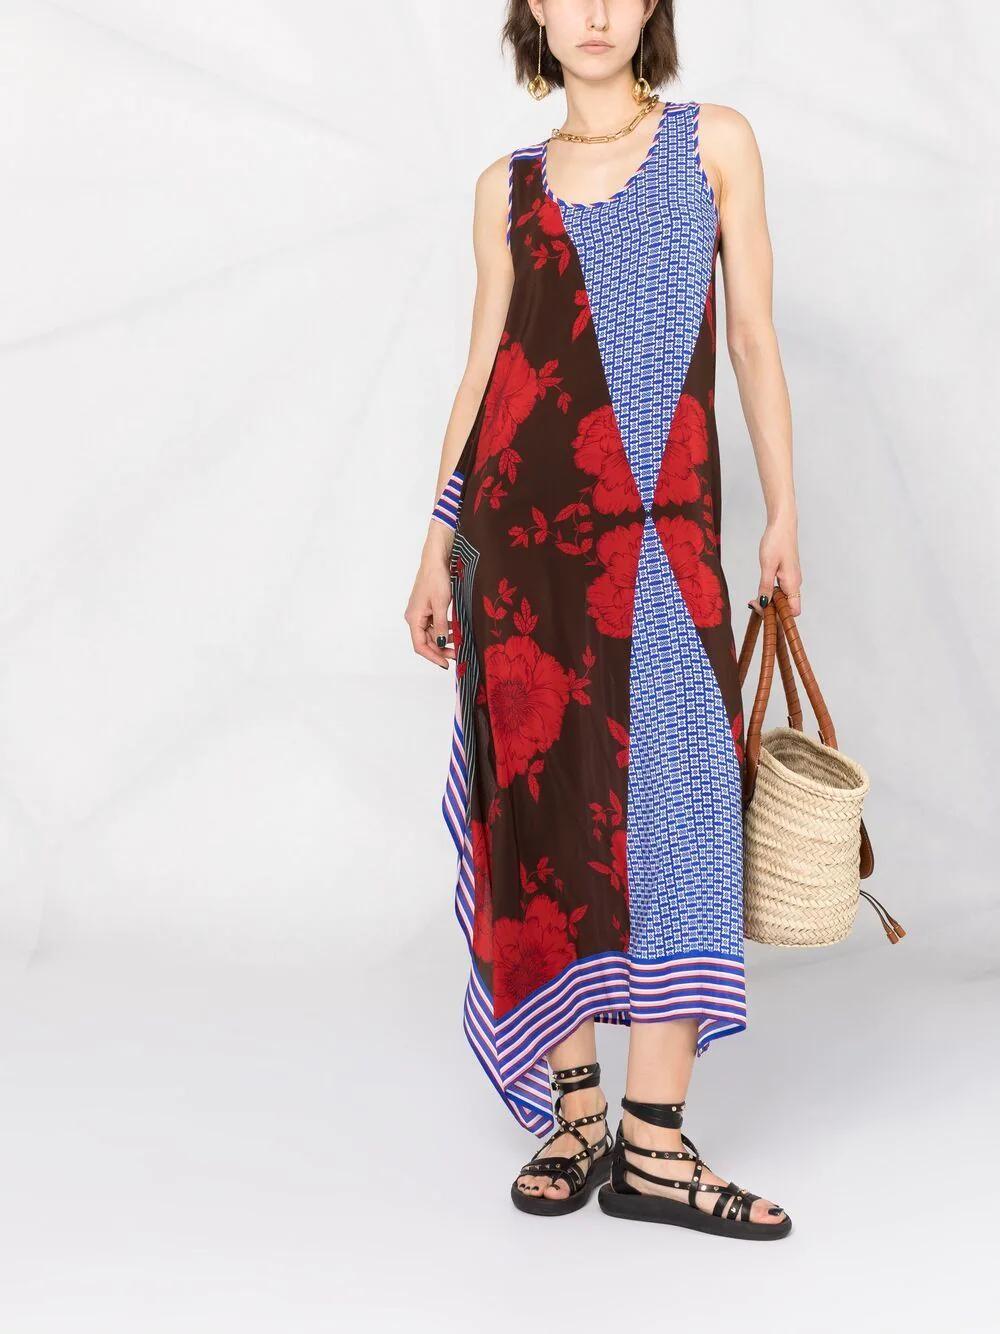 P.A.R.O.S.H. Panelled Silk Dress 559лв